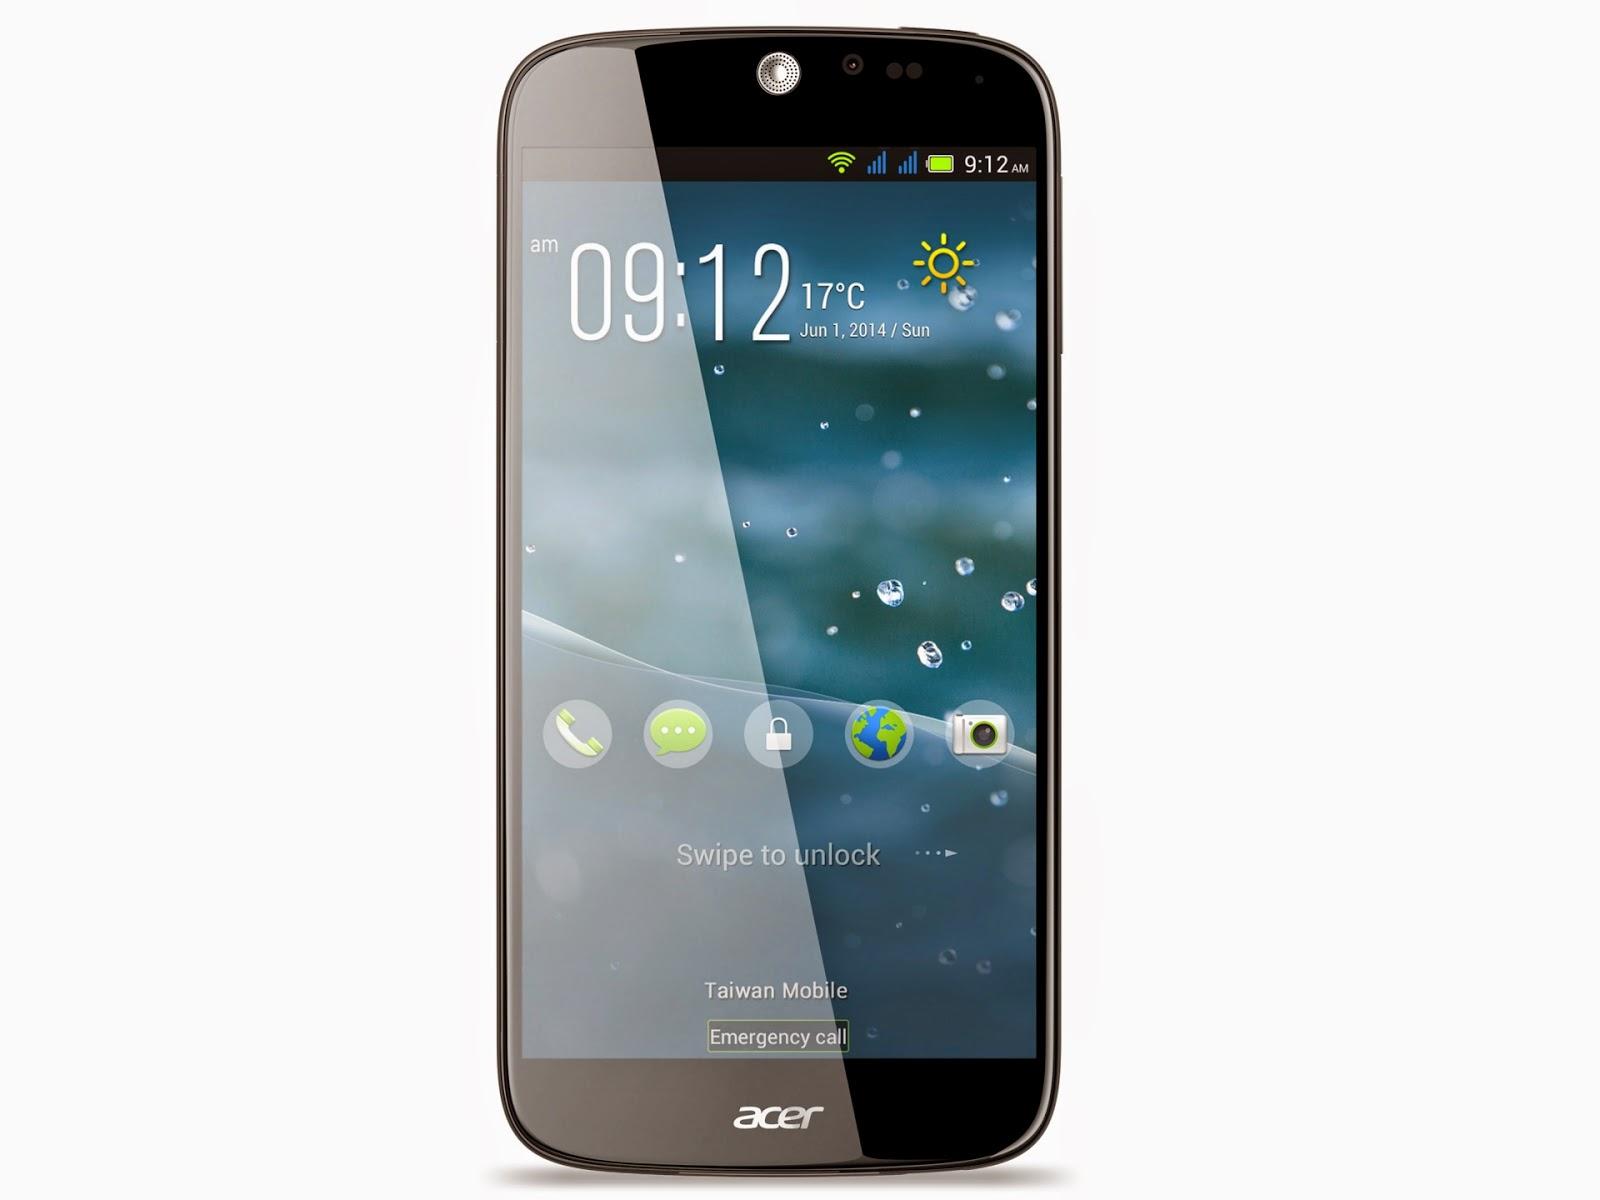 Harga Acer Liquid Jade Z Terbaru